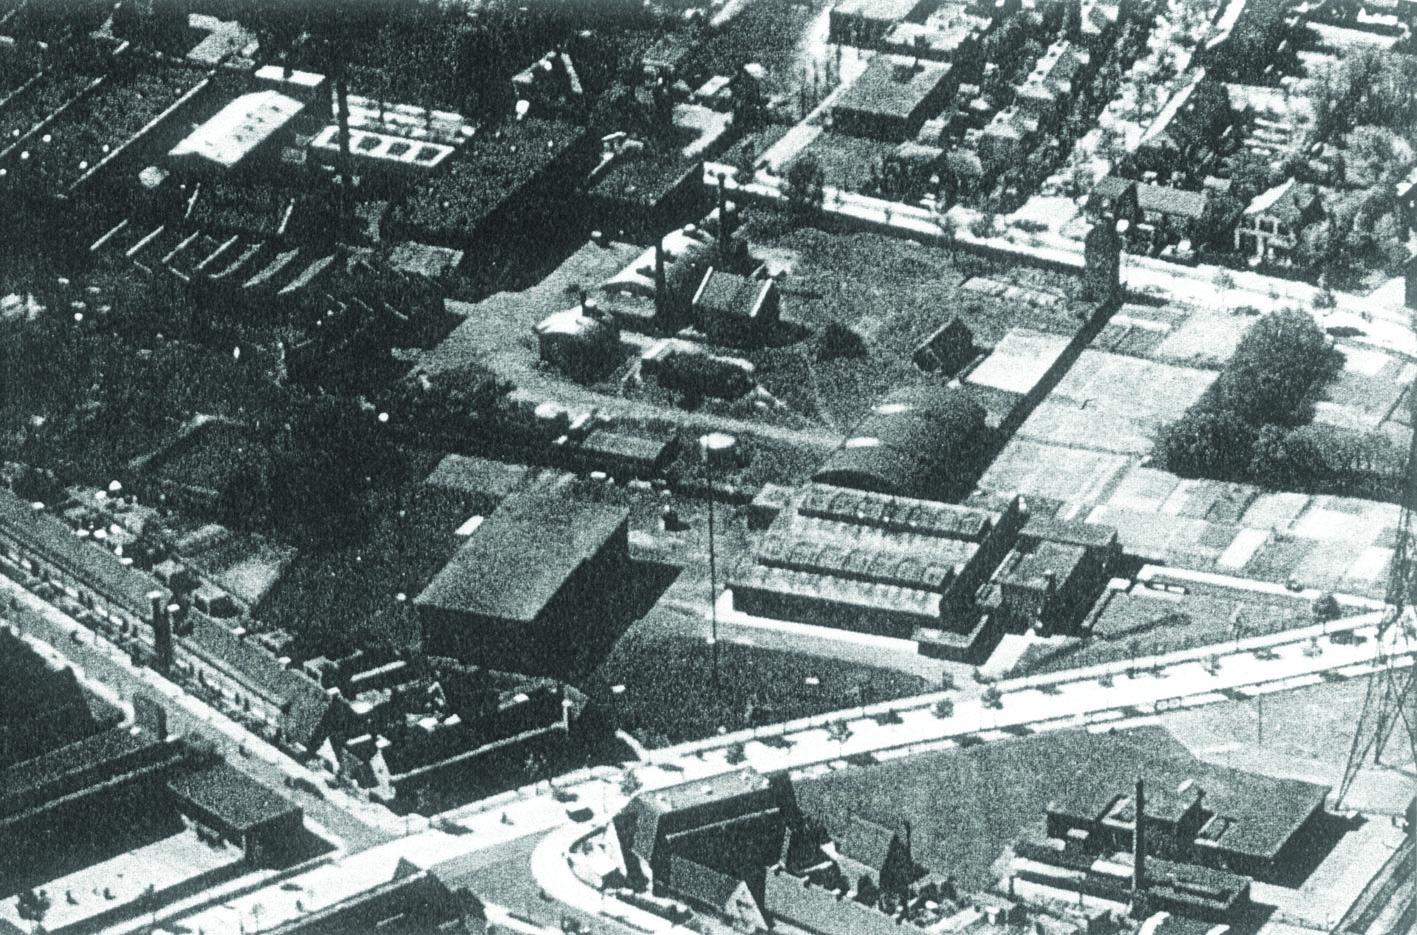 Lucent terrein 2 Ripolin 1935 Hilversum Alliantie Atelier PUUUR